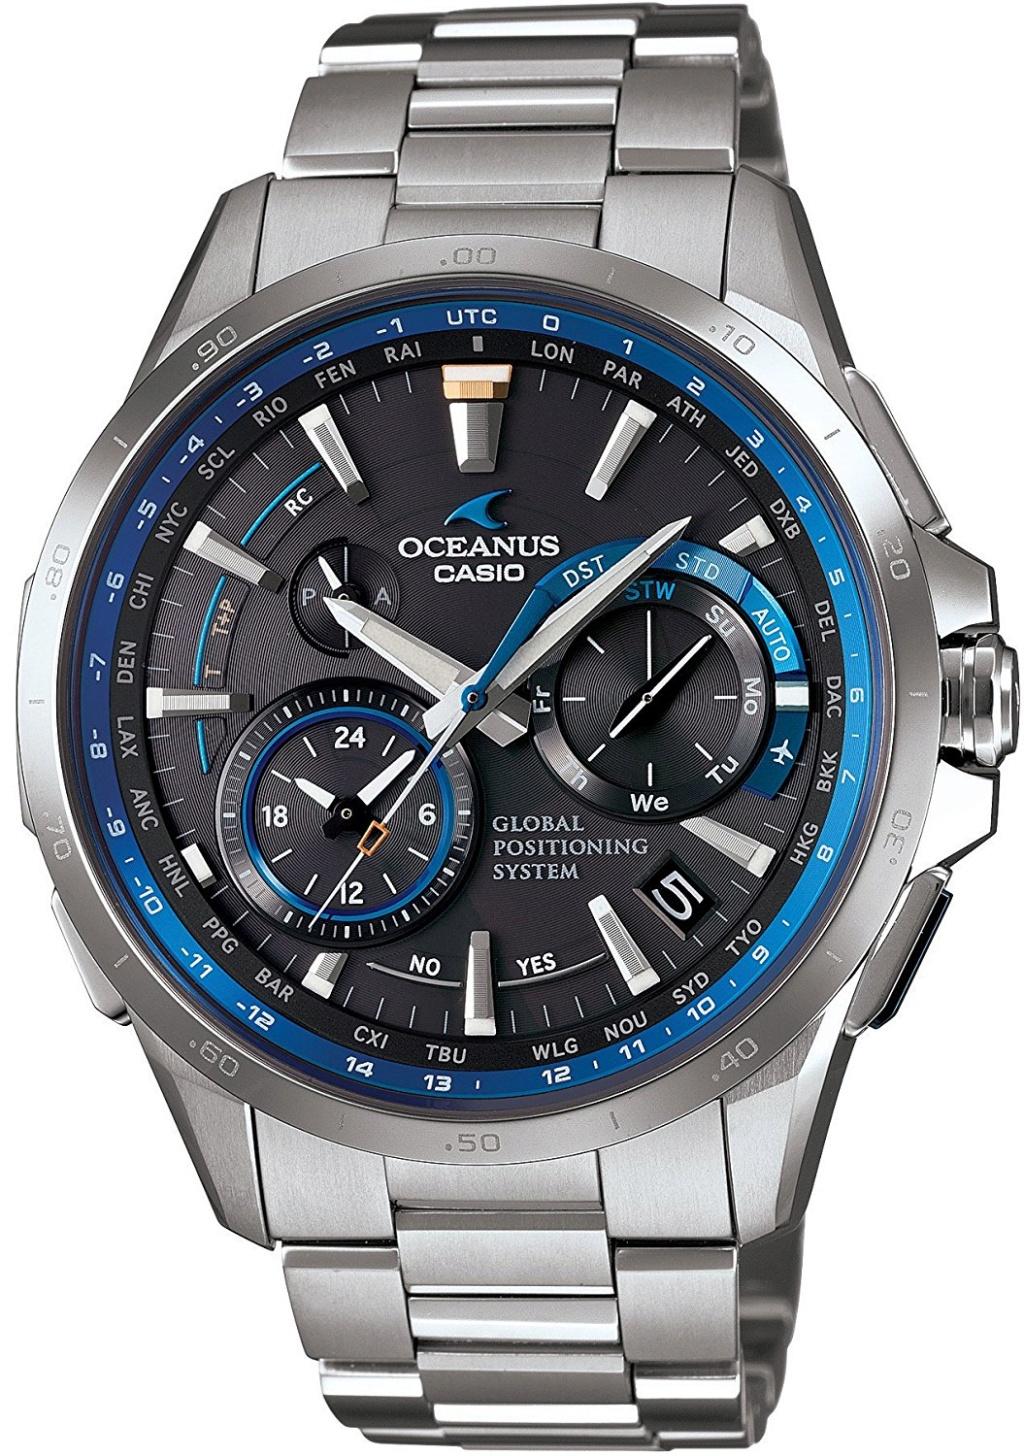 Casio Oceanus OCW-G1000-1AJF 91z9ji10